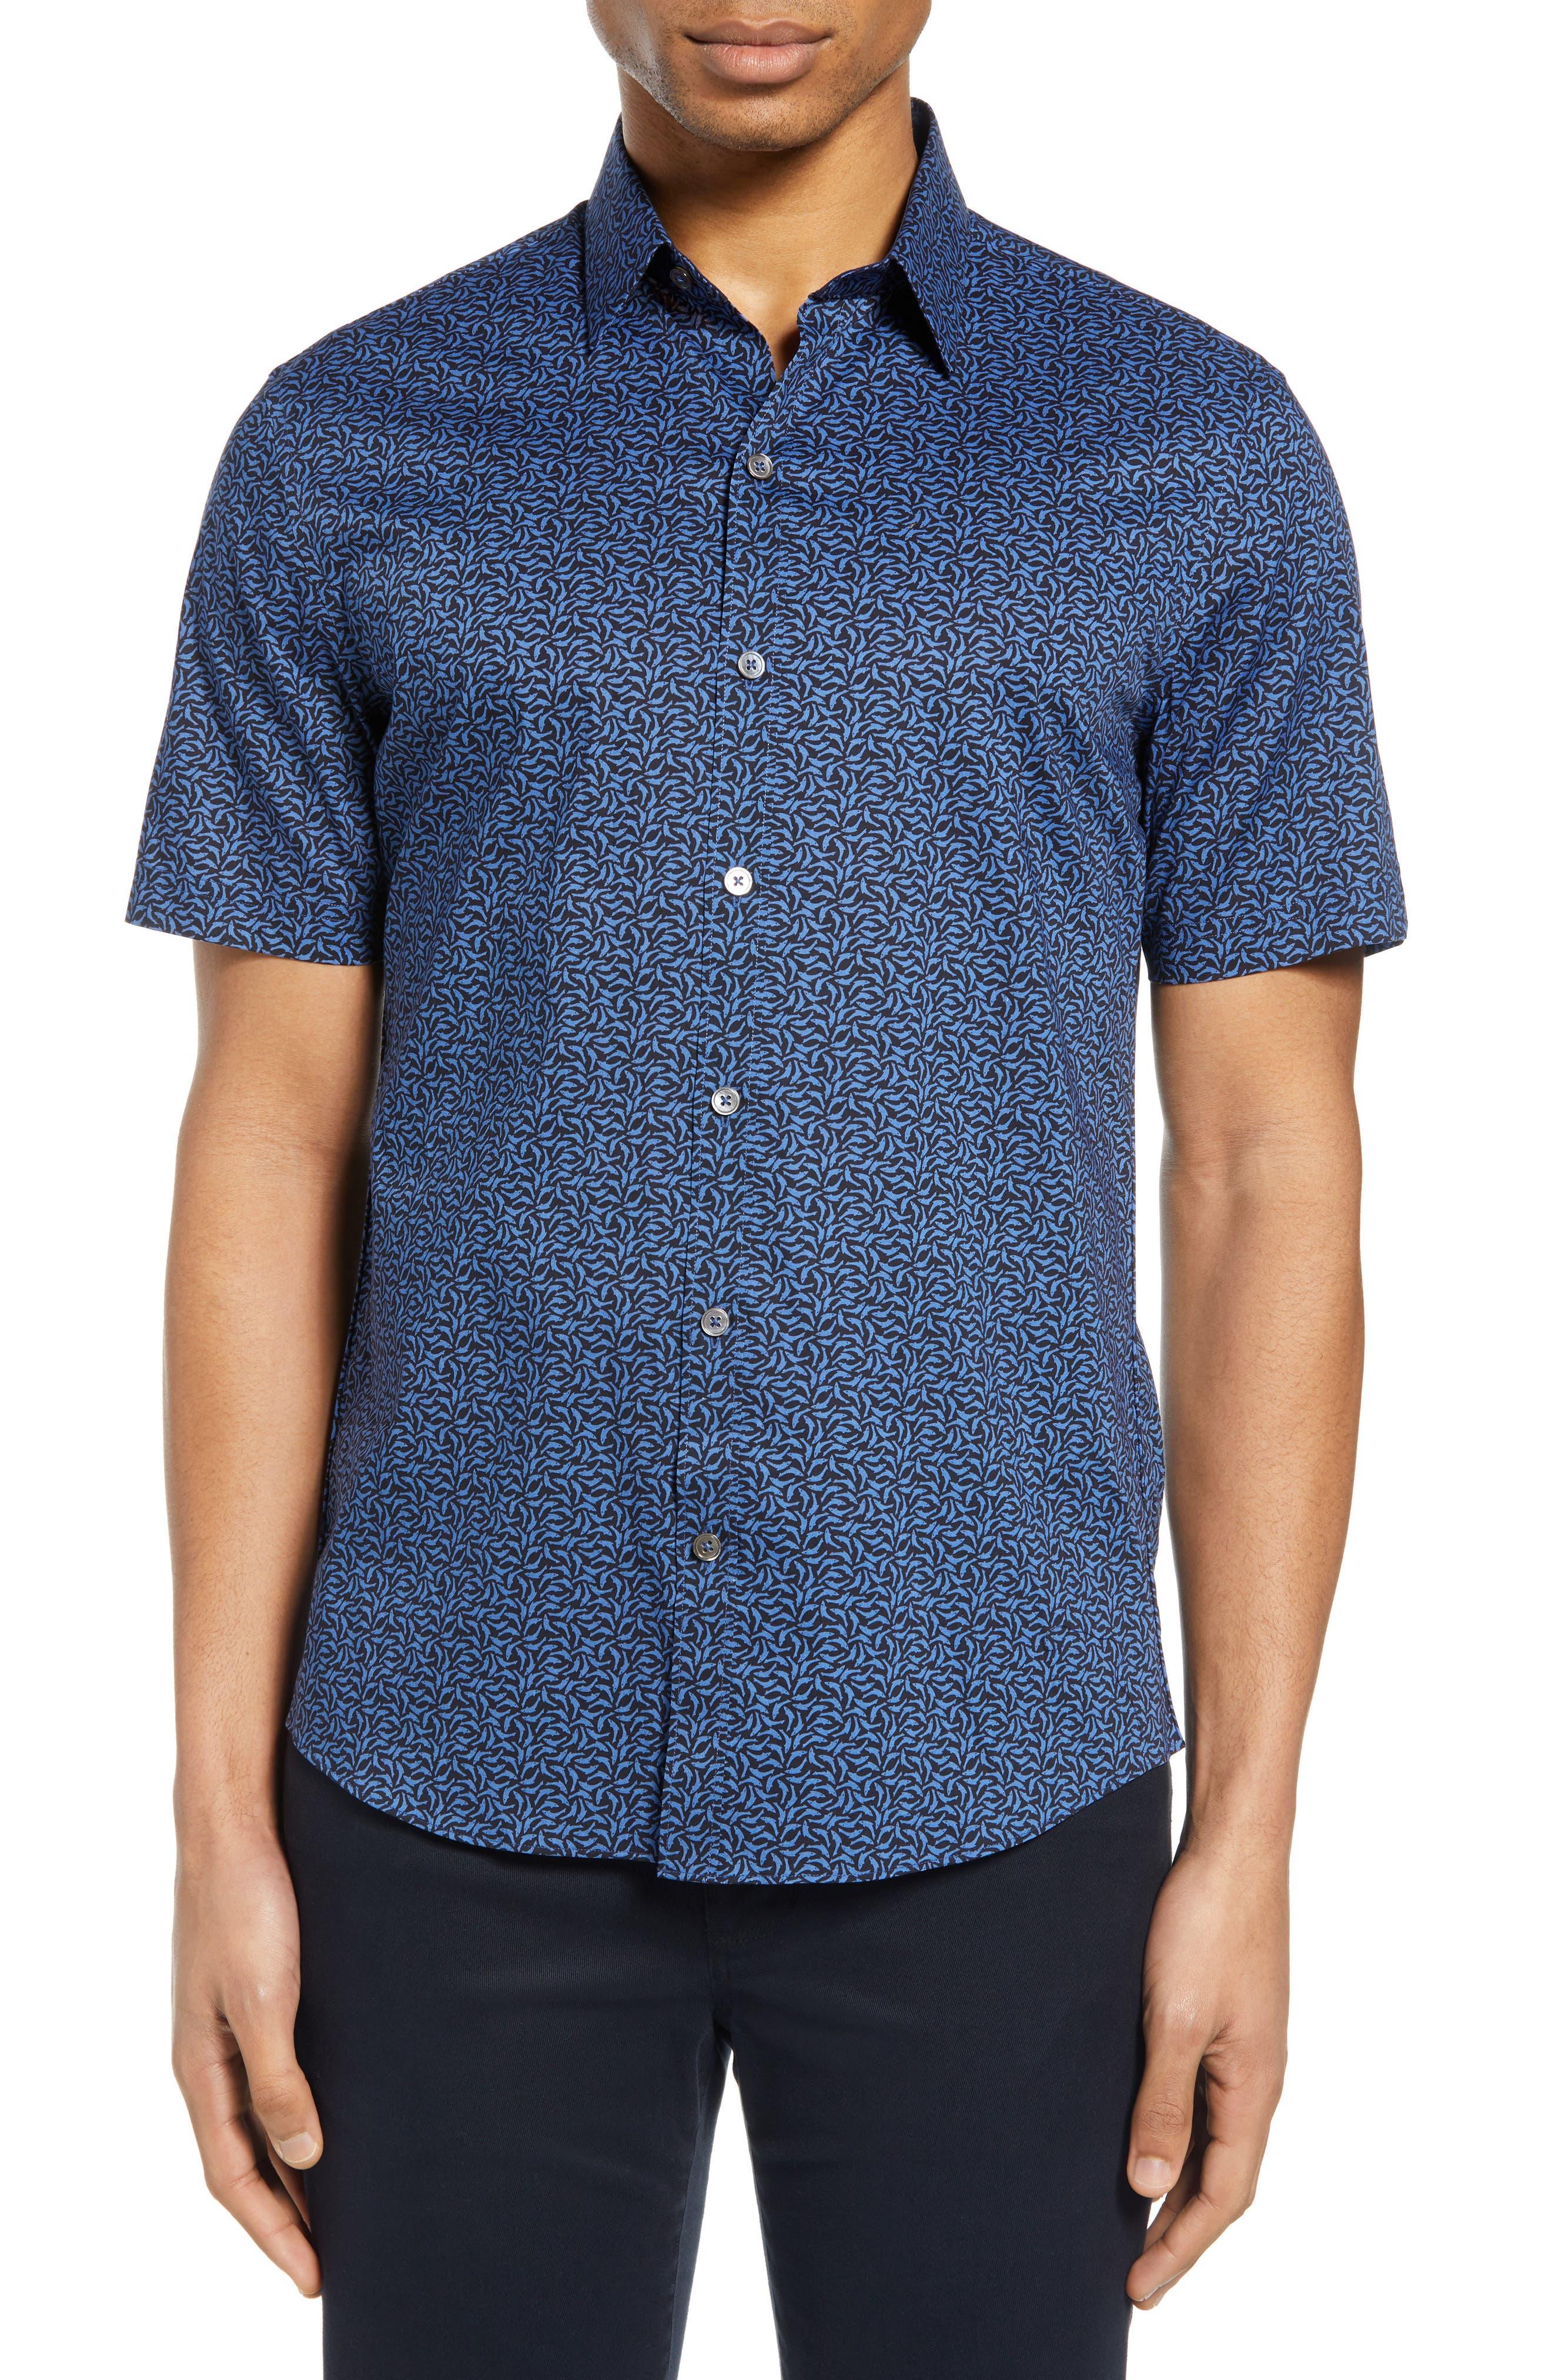 Image of Zachary Prell Oliver Regular Fit Short Sleeve Shirt